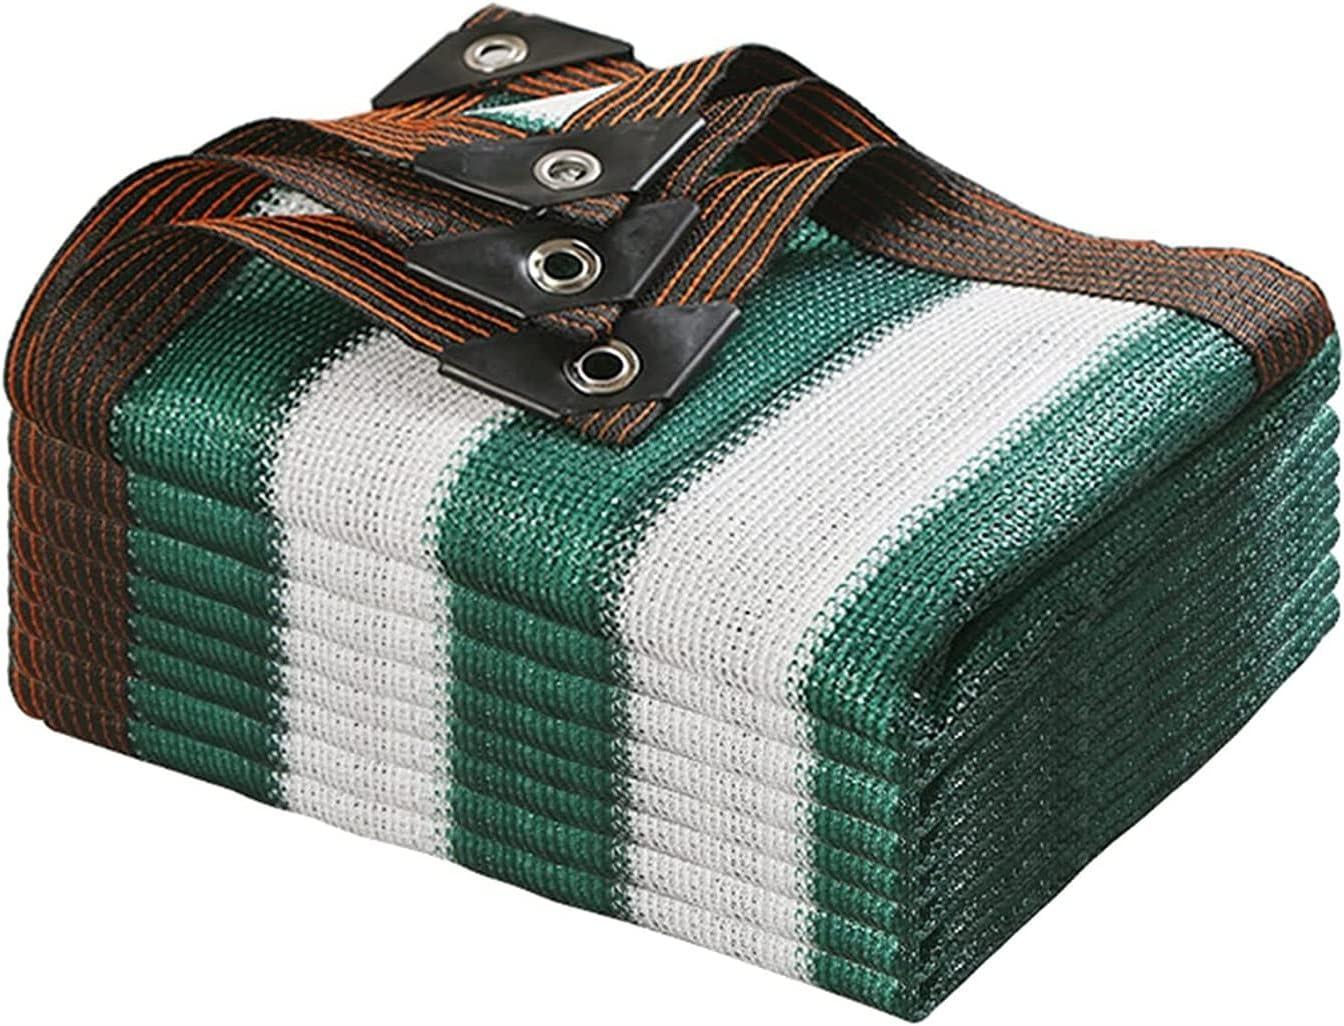 LLCY Max 66% OFF Shade Cloth Netting 90% Max 75% OFF Sunblock Anti-UV